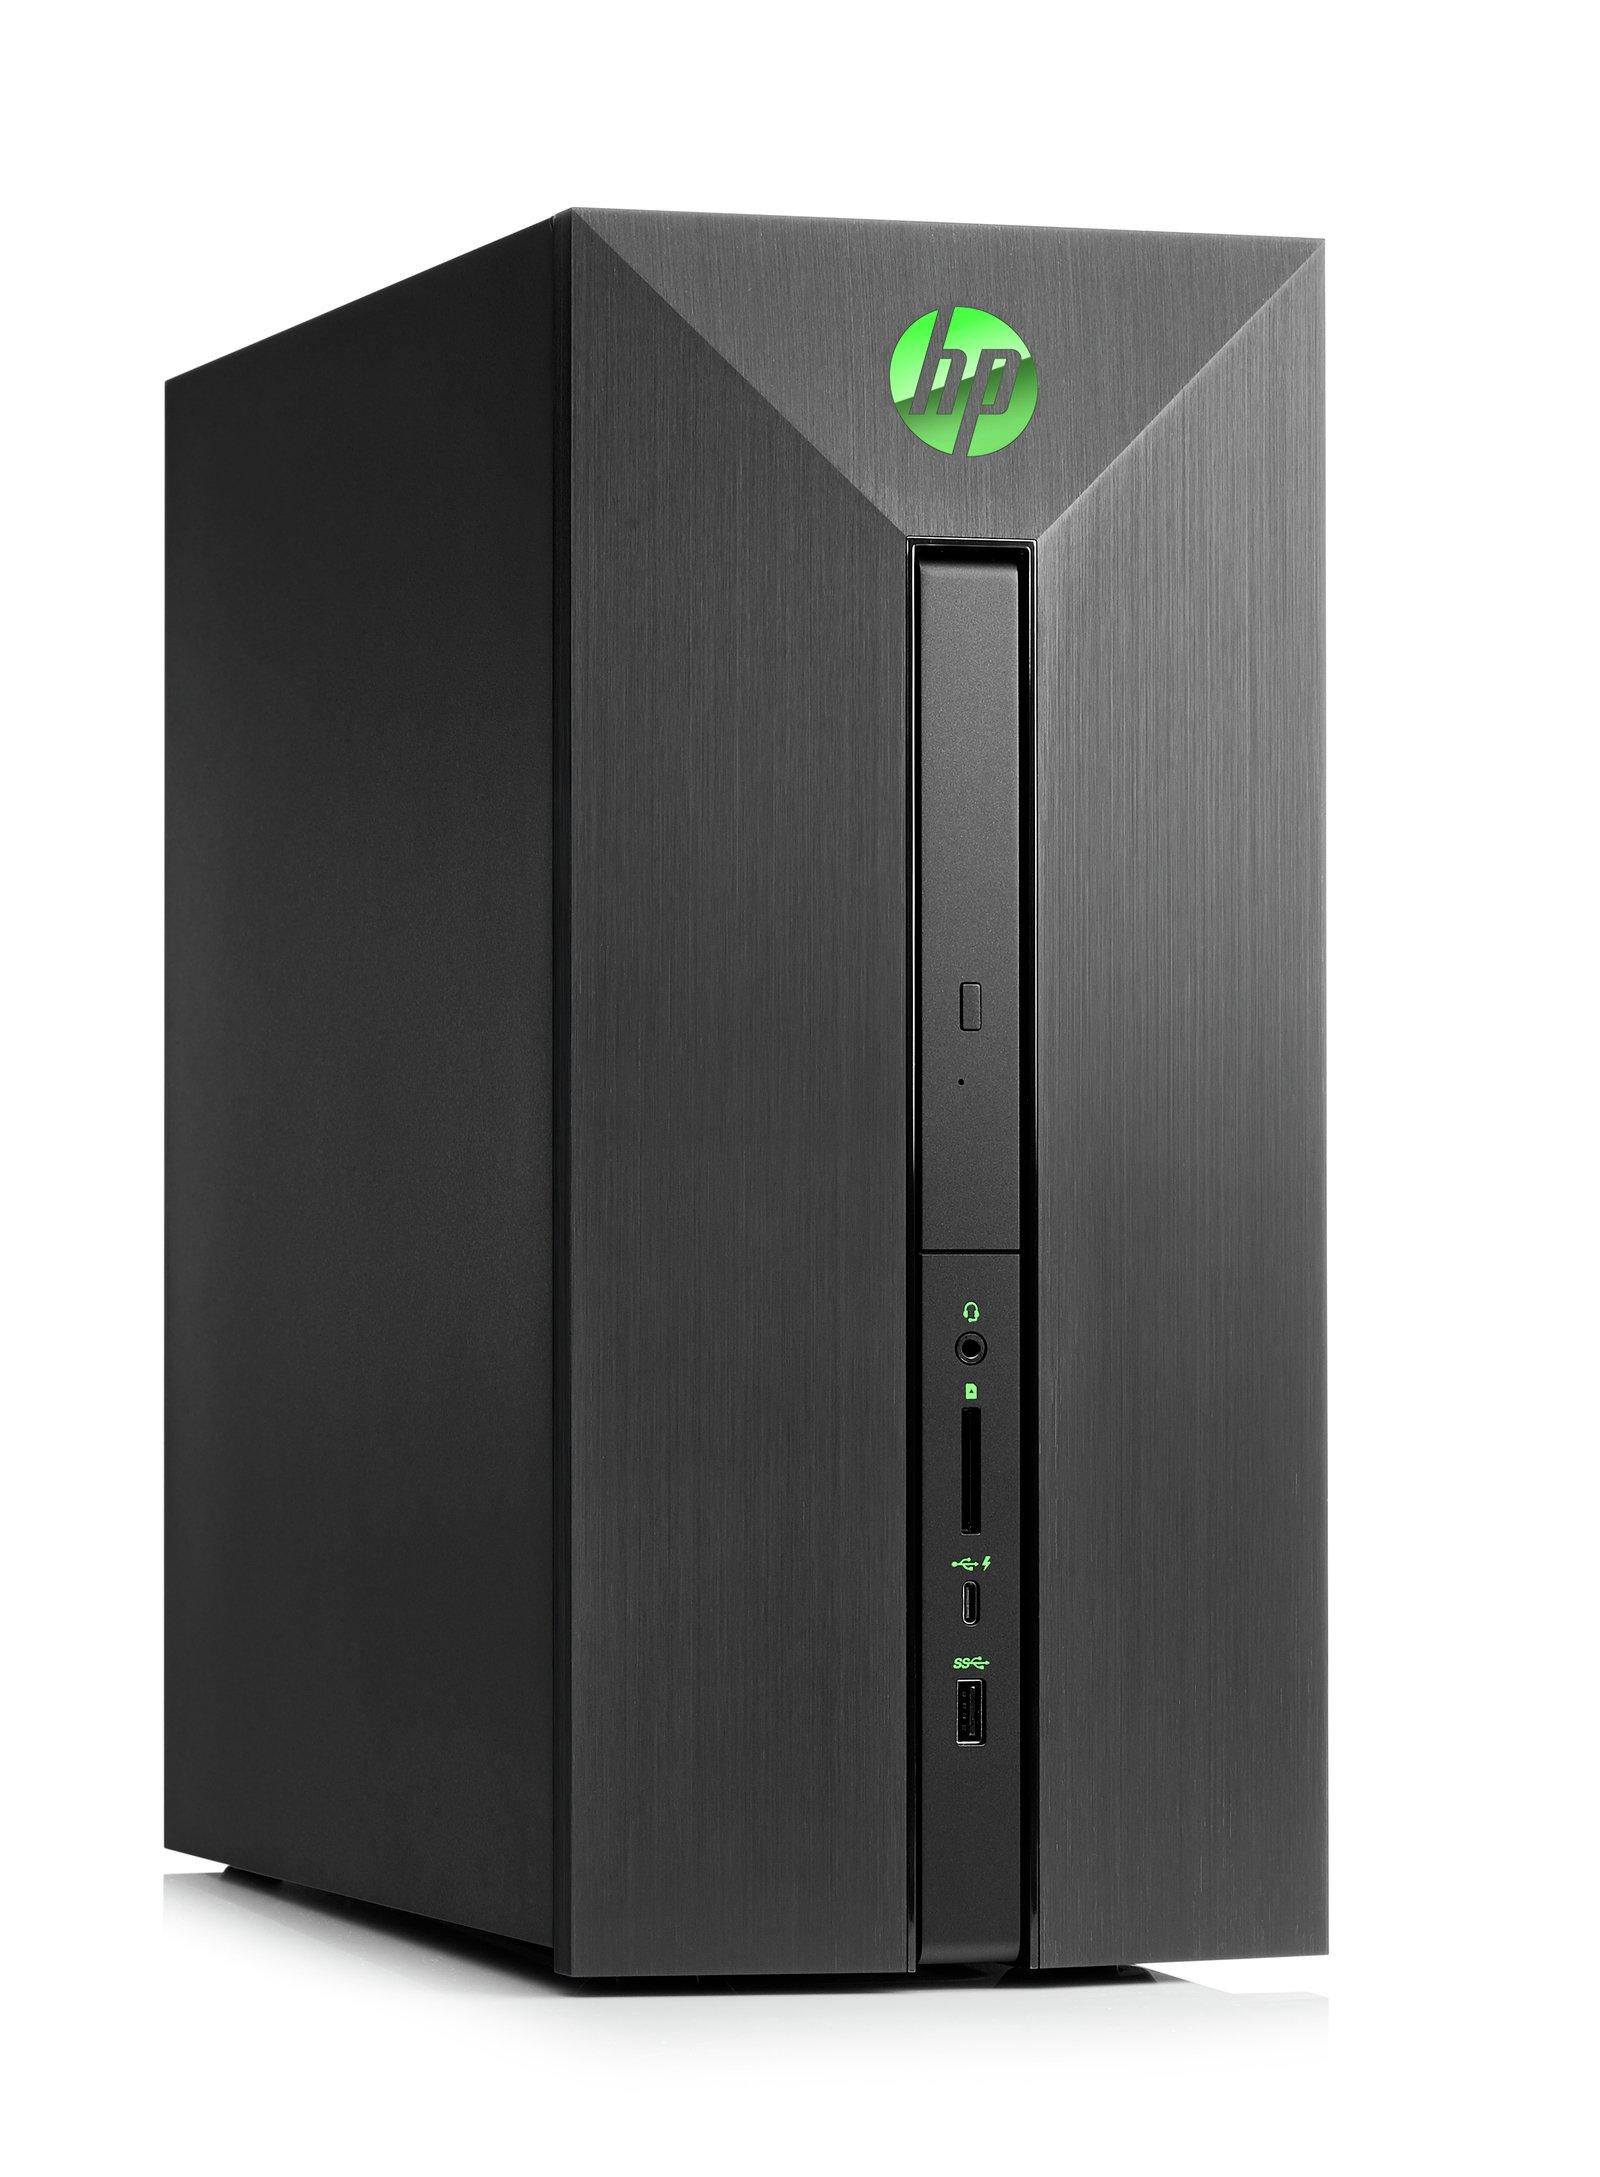 2018 Newest Flagship HP Pavilion Power Premium Gaming VR Ready Desktop Computer (Intel Core i5-7400, NVIDIA GeForce GTX 1060 3GB, 16GB DDR4 RAM, 128GB SSD + 1TB HDD, Bluetooth, HDMI, Windows 10) by HP (Image #3)